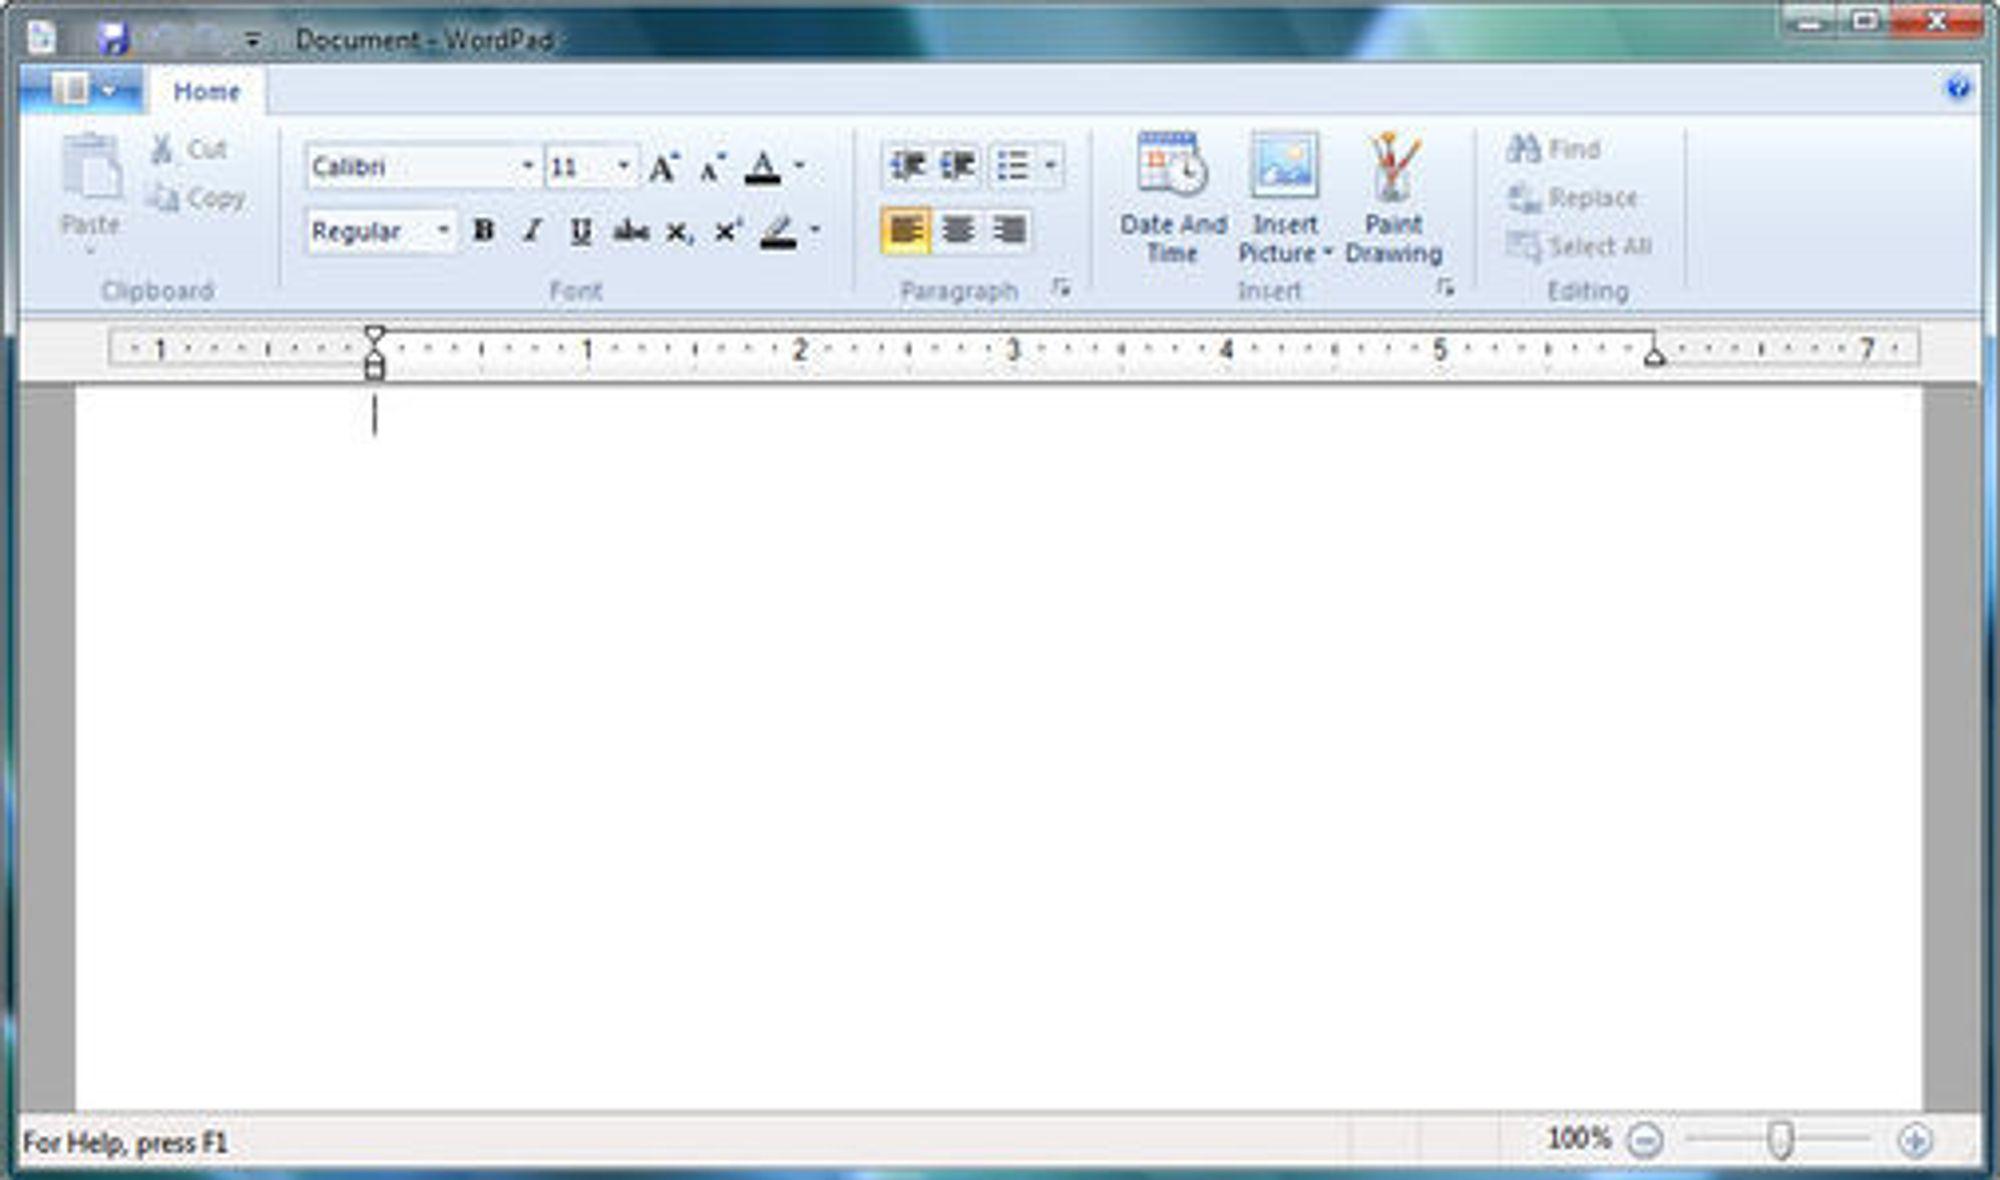 Skriveverktøyet Wordpad, nå med ribbons.